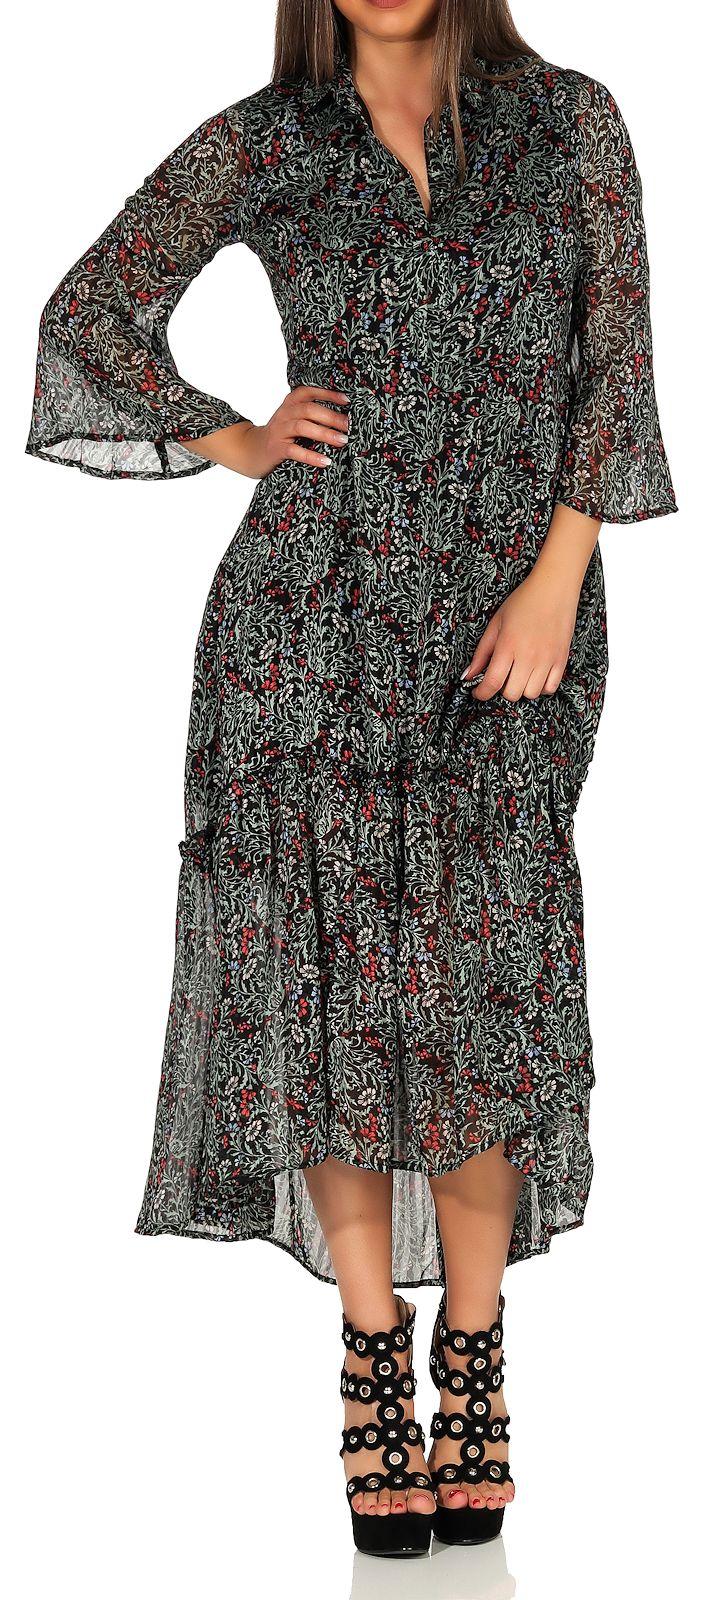 Vero Moda Damen Kleid Maxikleid Sommerkleid Strandkleid Bohokleid 3 4 Arm Liva Ebay